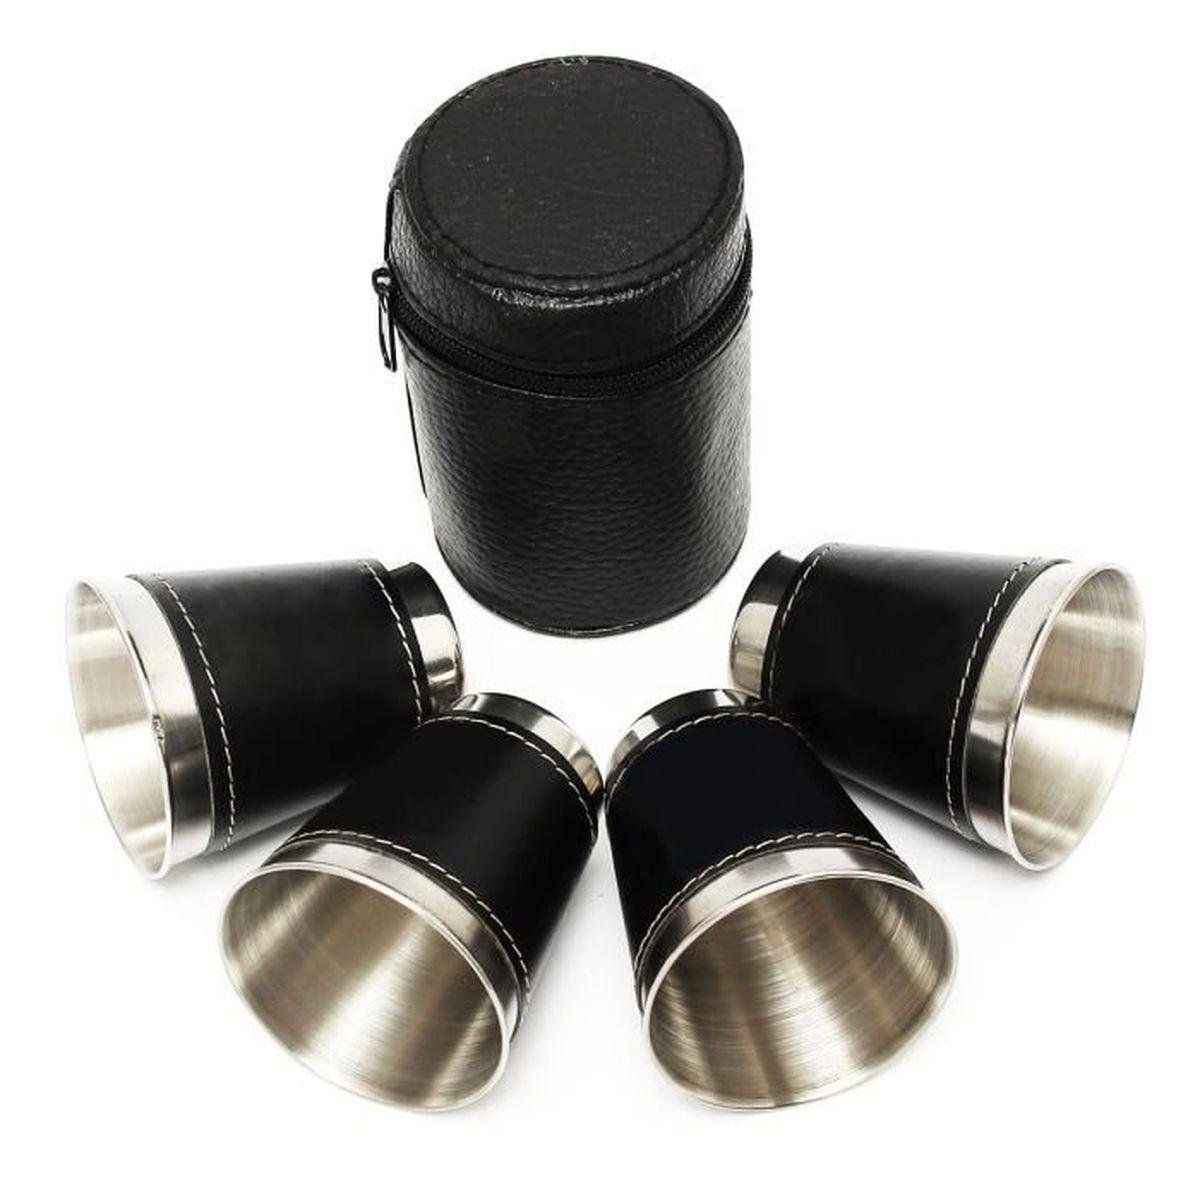 gobelet inox achat vente gobelet inox pas cher soldes d s le 10 janvier cdiscount. Black Bedroom Furniture Sets. Home Design Ideas